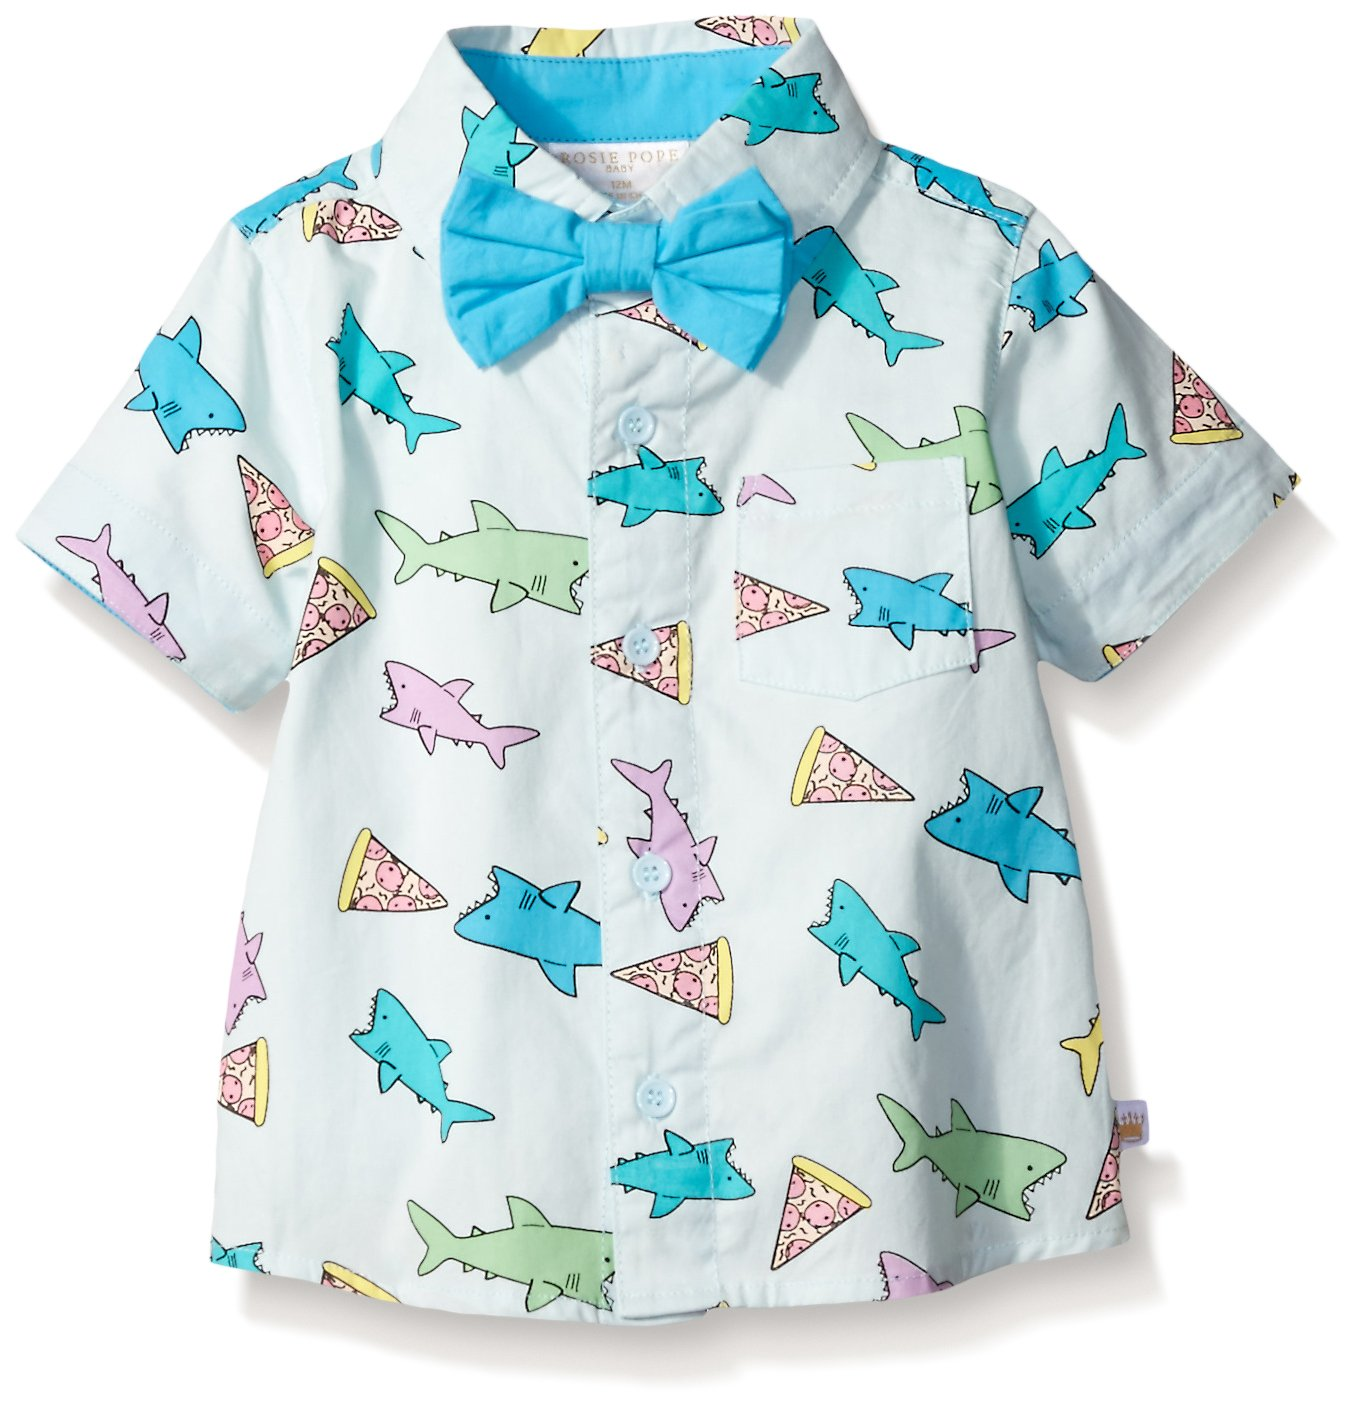 Rosie Pope Baby Boys' Dress Shirt, Light Blue, 18M by Rosie Pope (Image #1)